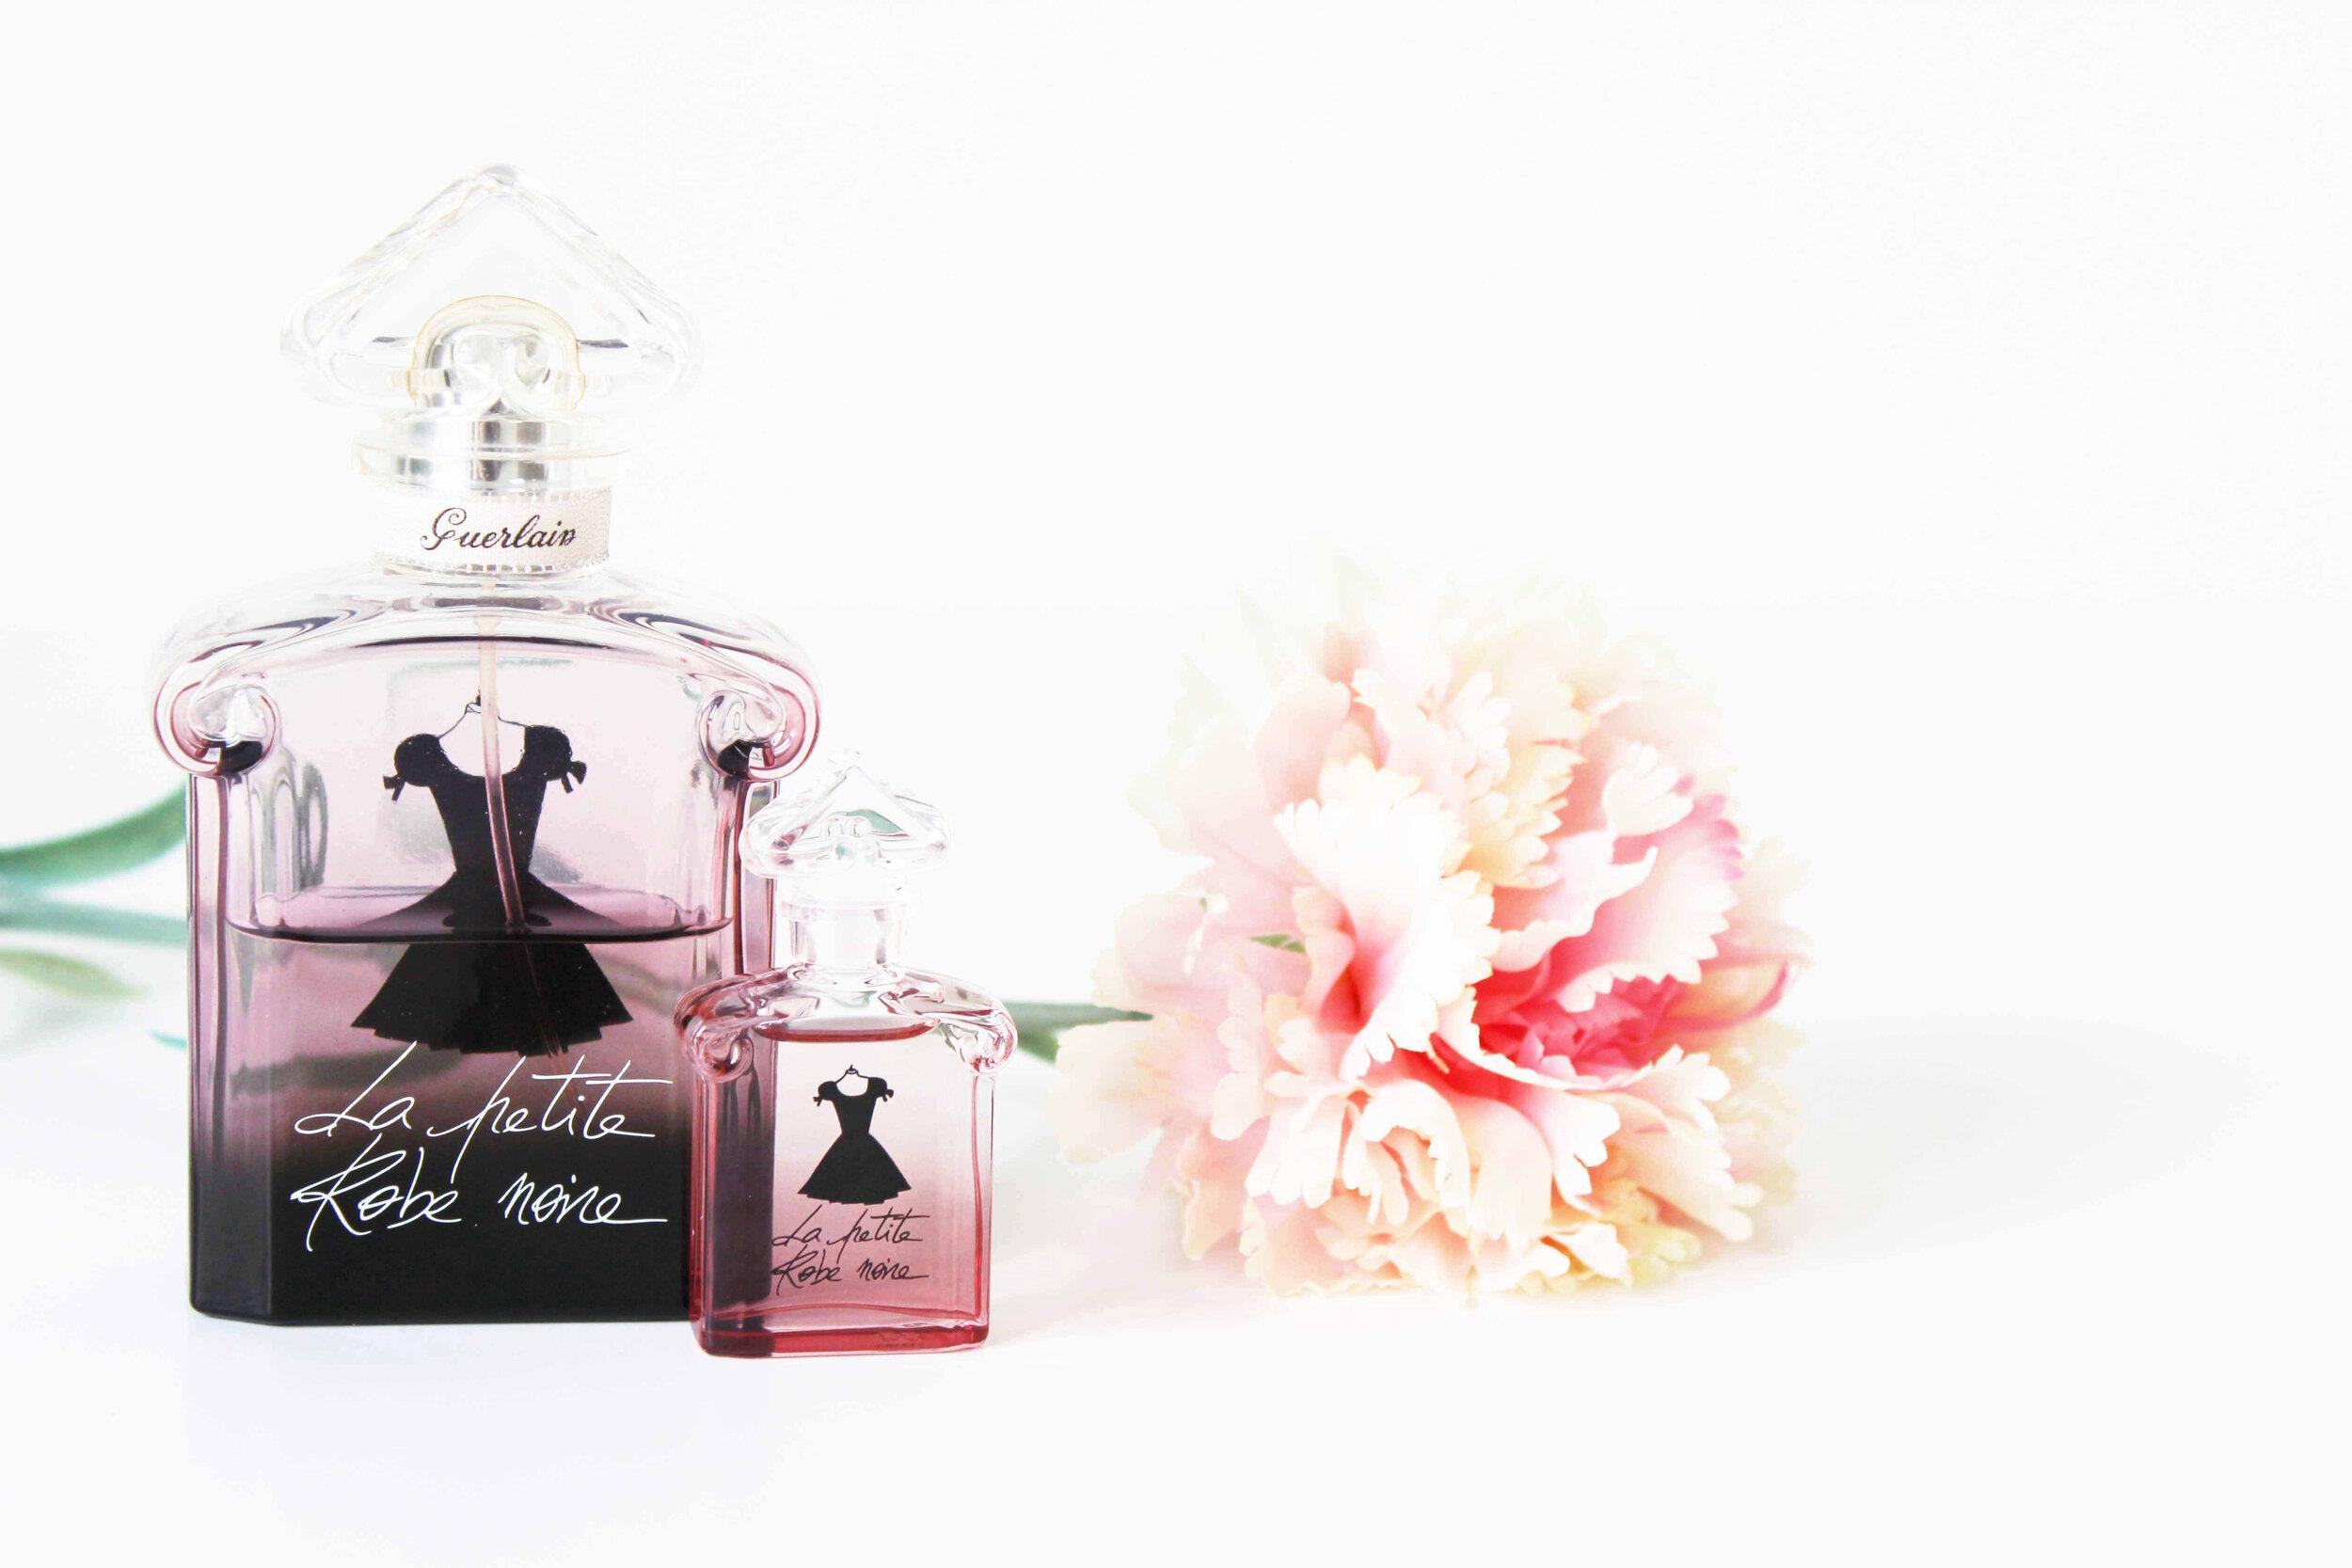 La petite robe guerlain review